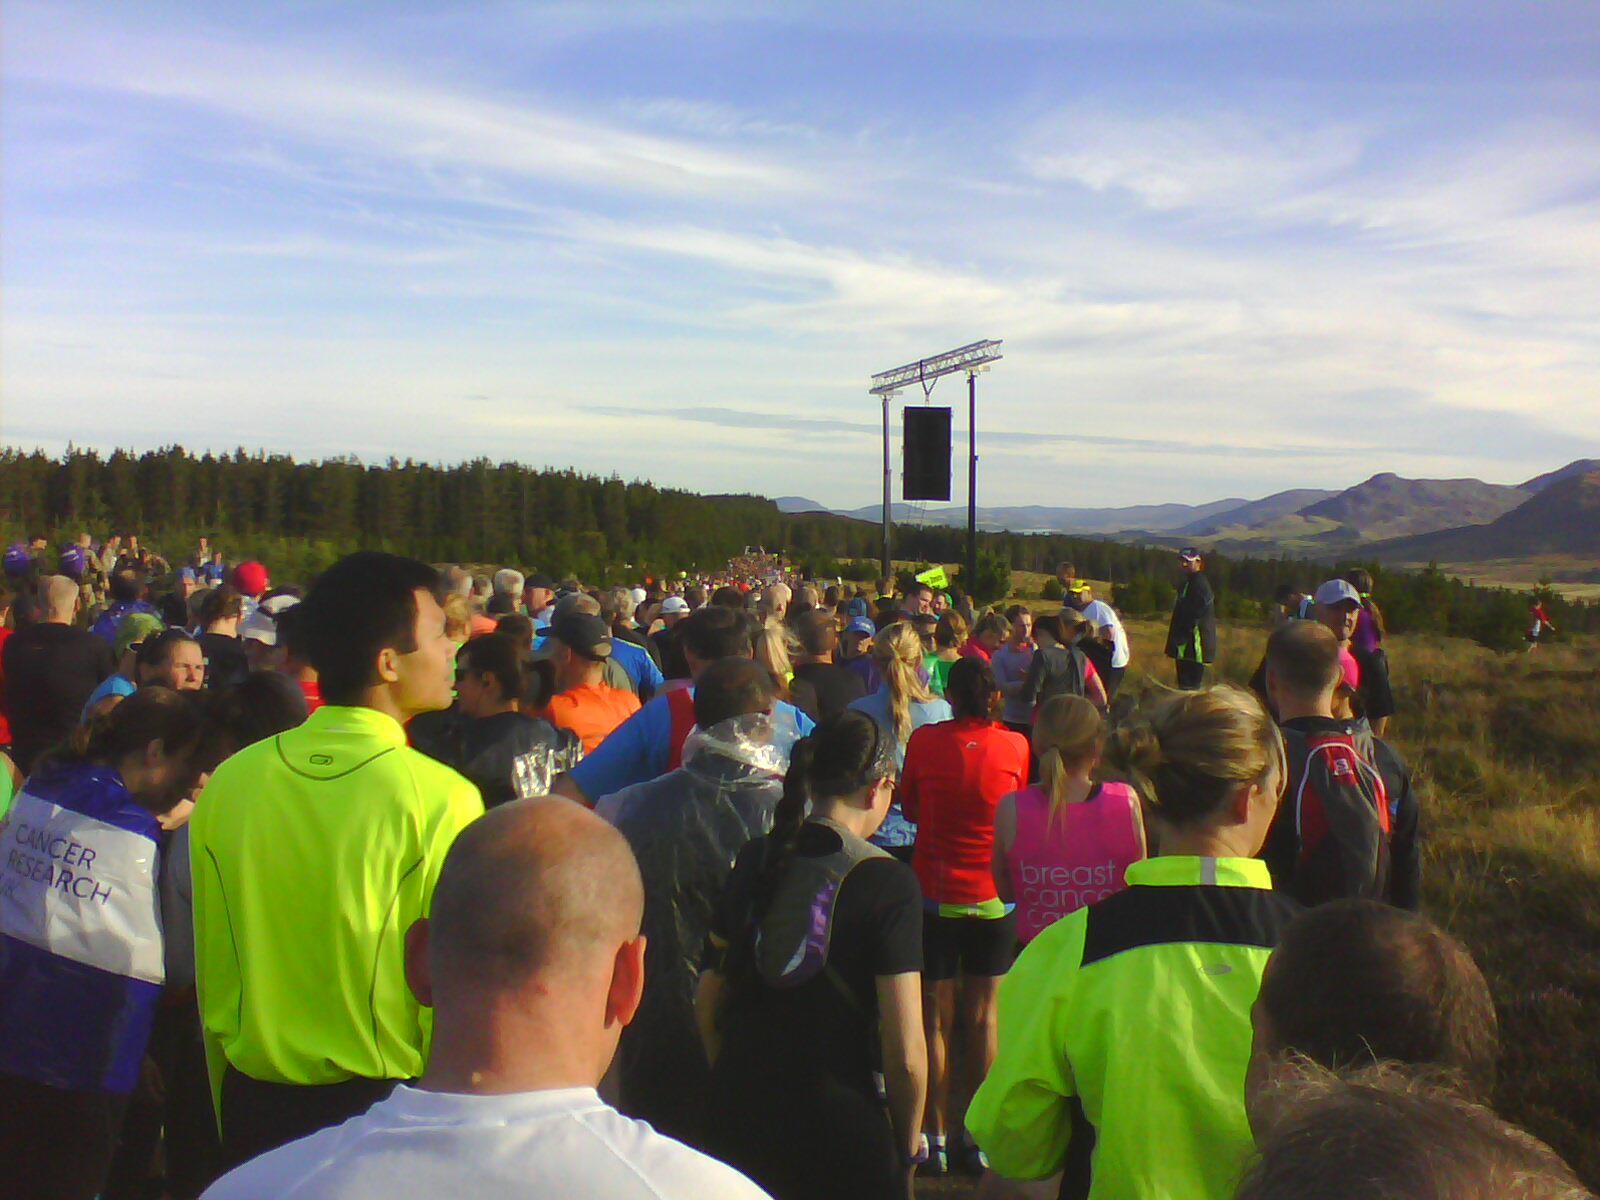 At the start of the Loch Ness Marathon